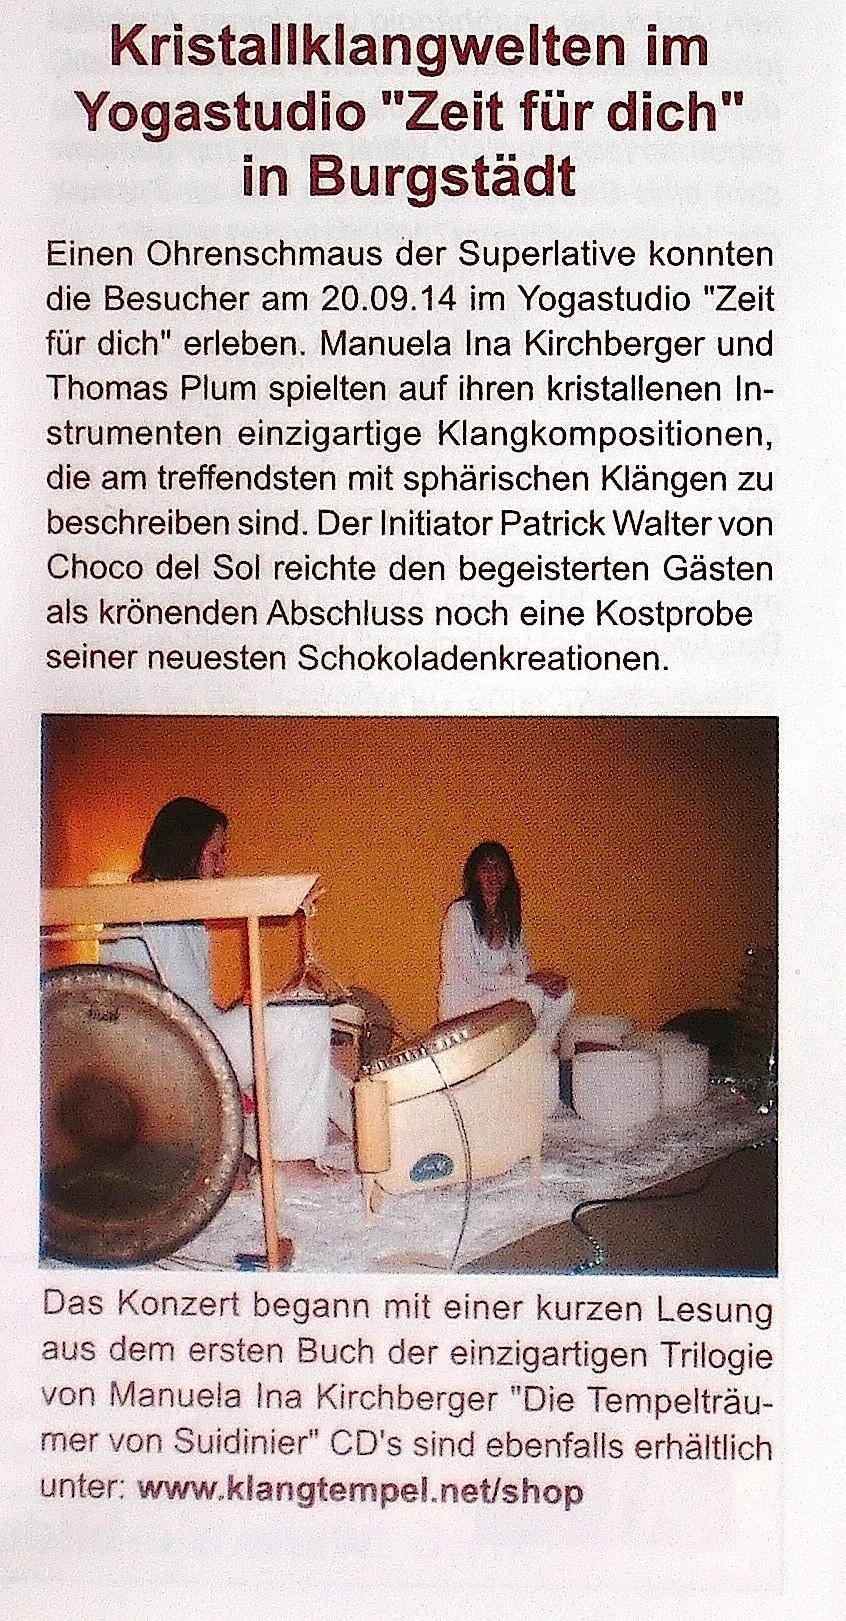 v.l. Patrik Walter (Coco del Sol), Manuela Ina Kirchberger, Thomas Plum     (Trommelgeflüster 9/2014-)